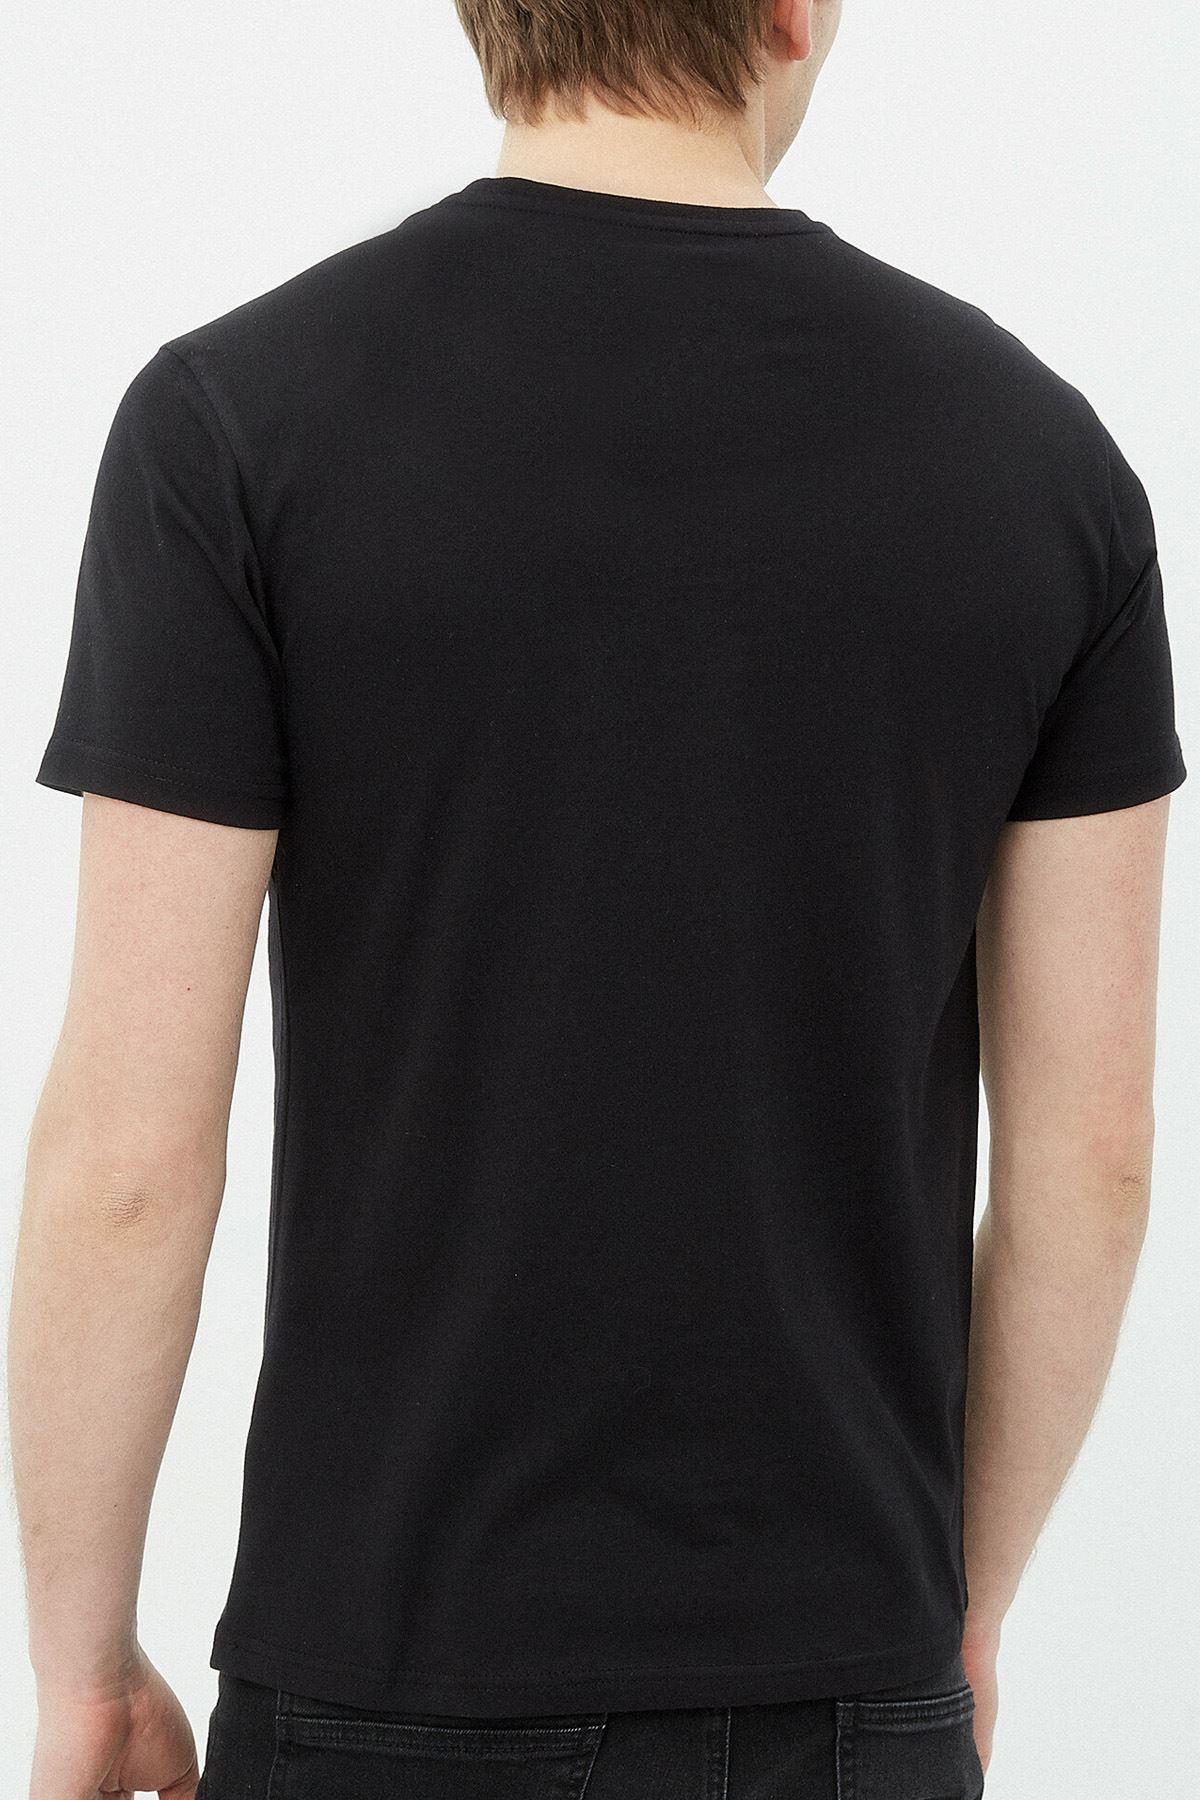 Anime Bebop Siyah Erkek Tshirt - Tişört